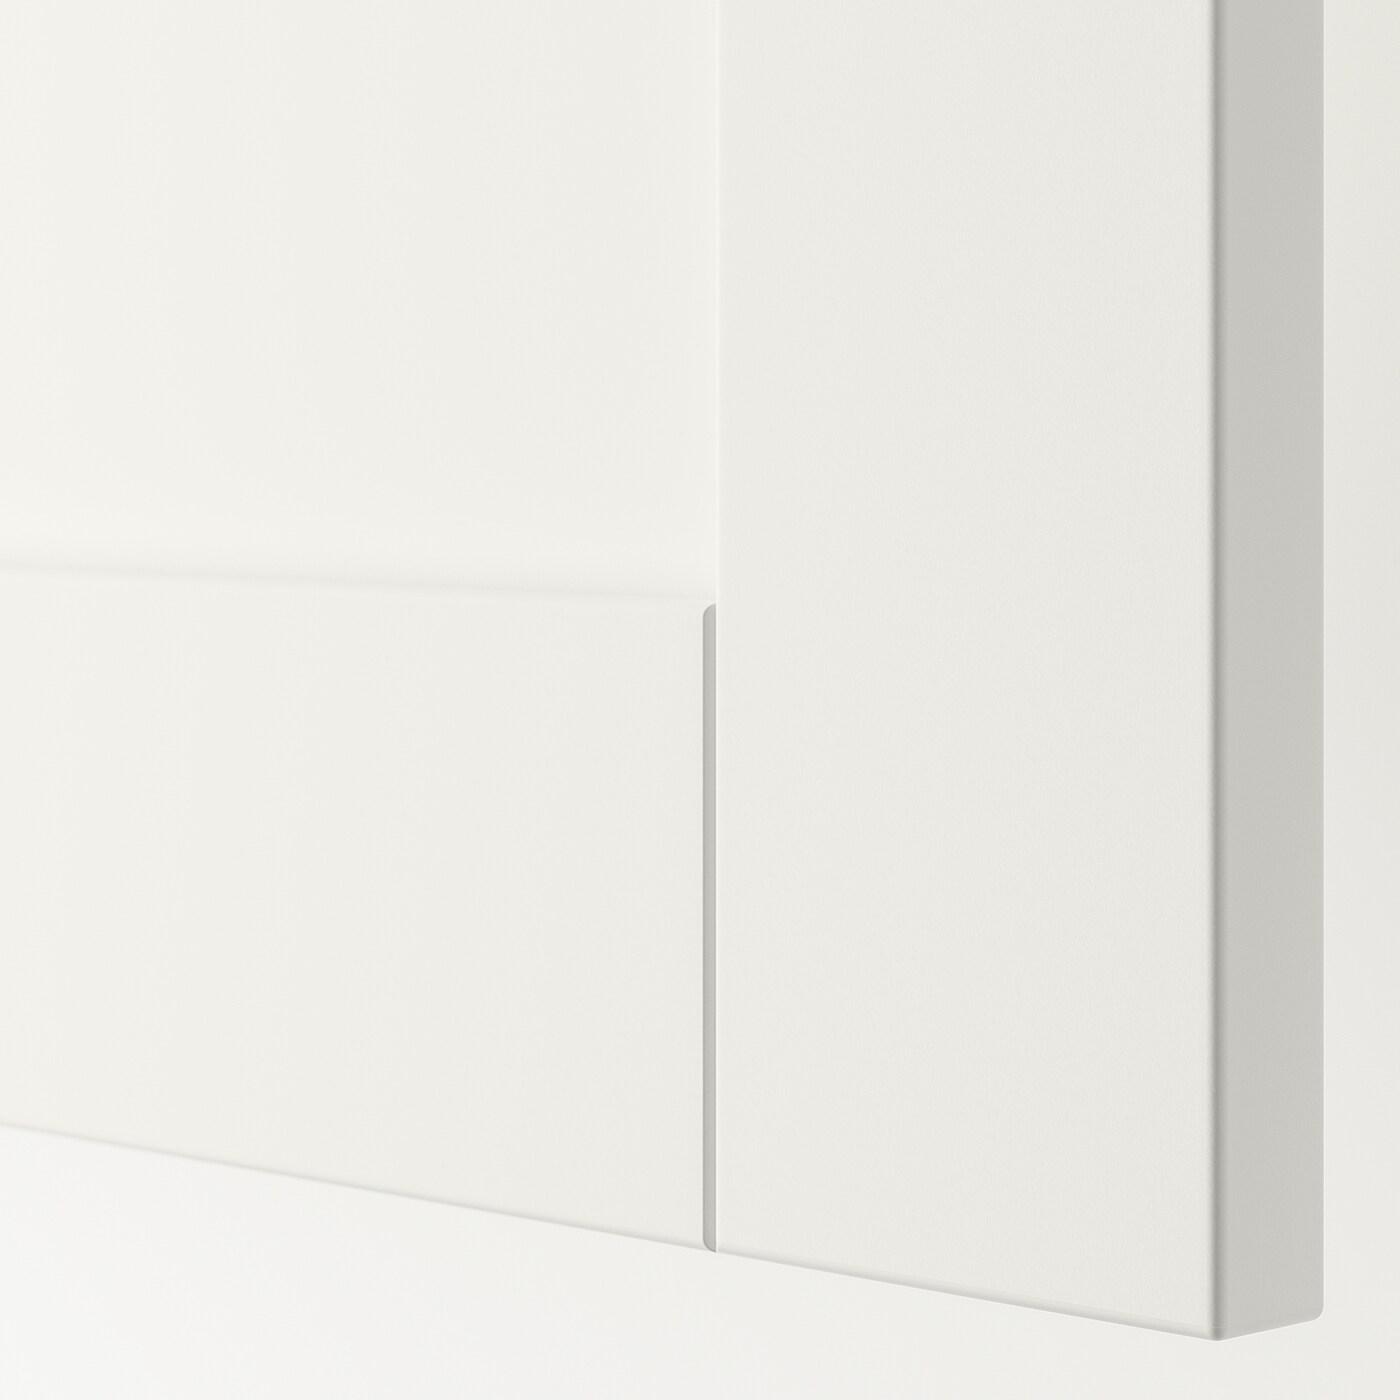 SANNIDAL Door with hinges, white, 60x40 cm